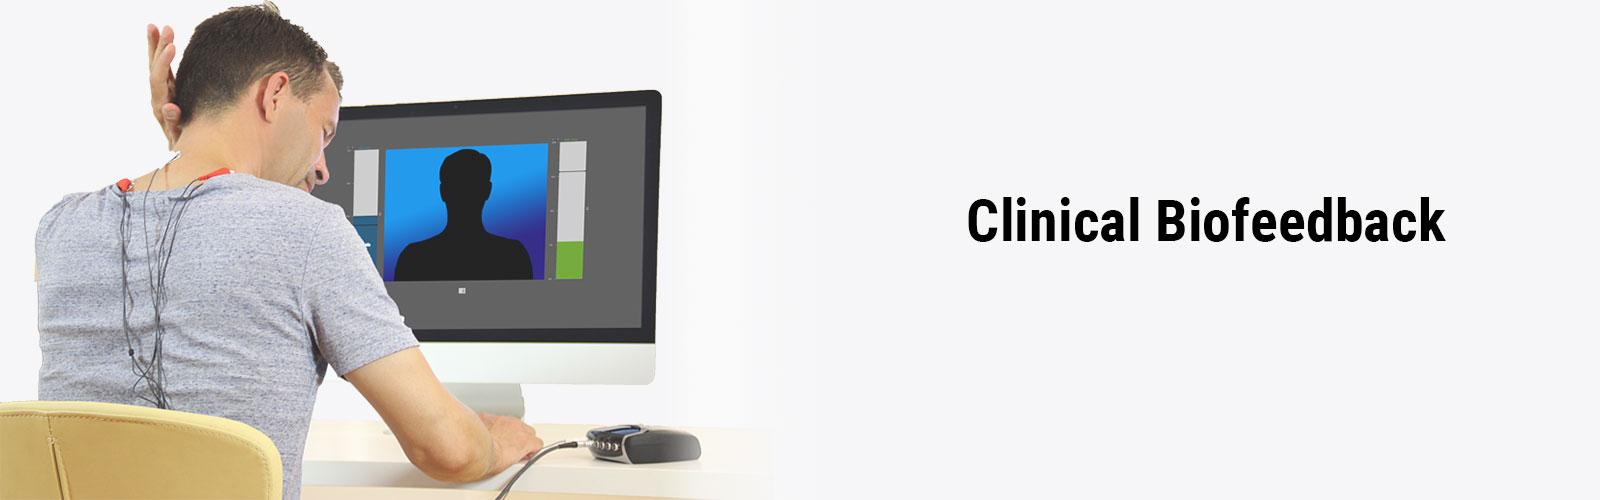 clinical-biofeedback-banner